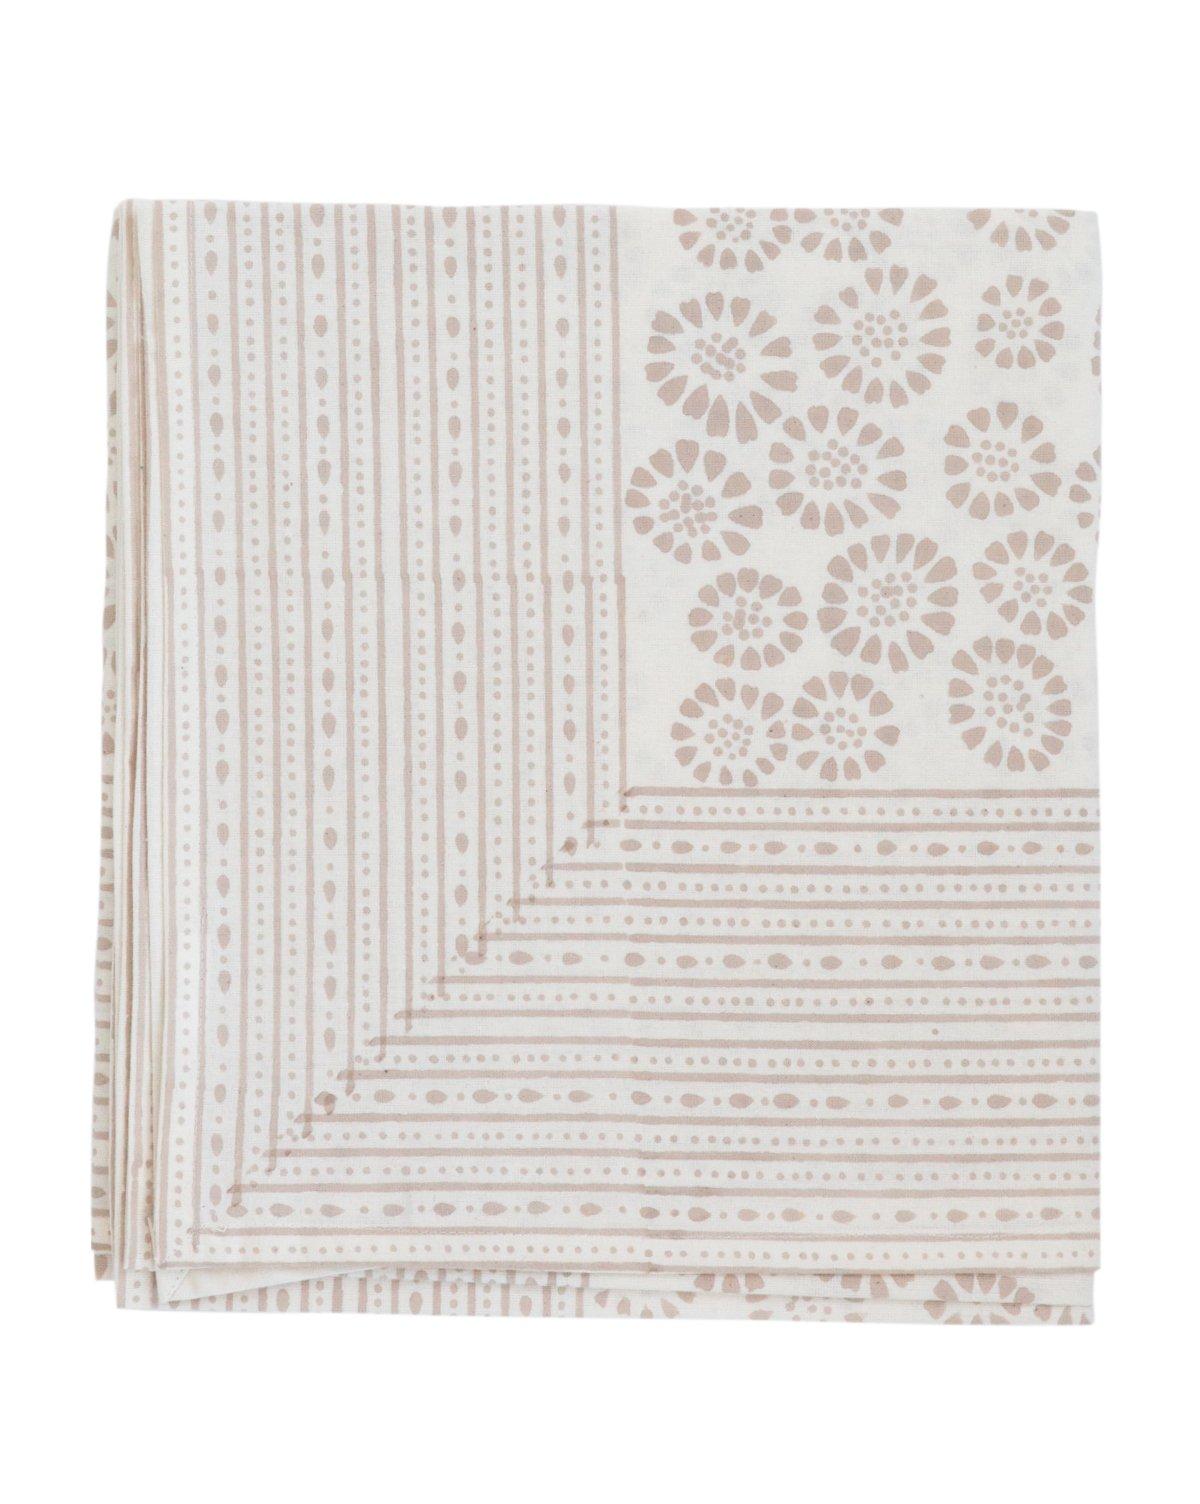 Block_Printed_Table_Cloth_1 (1).jpg